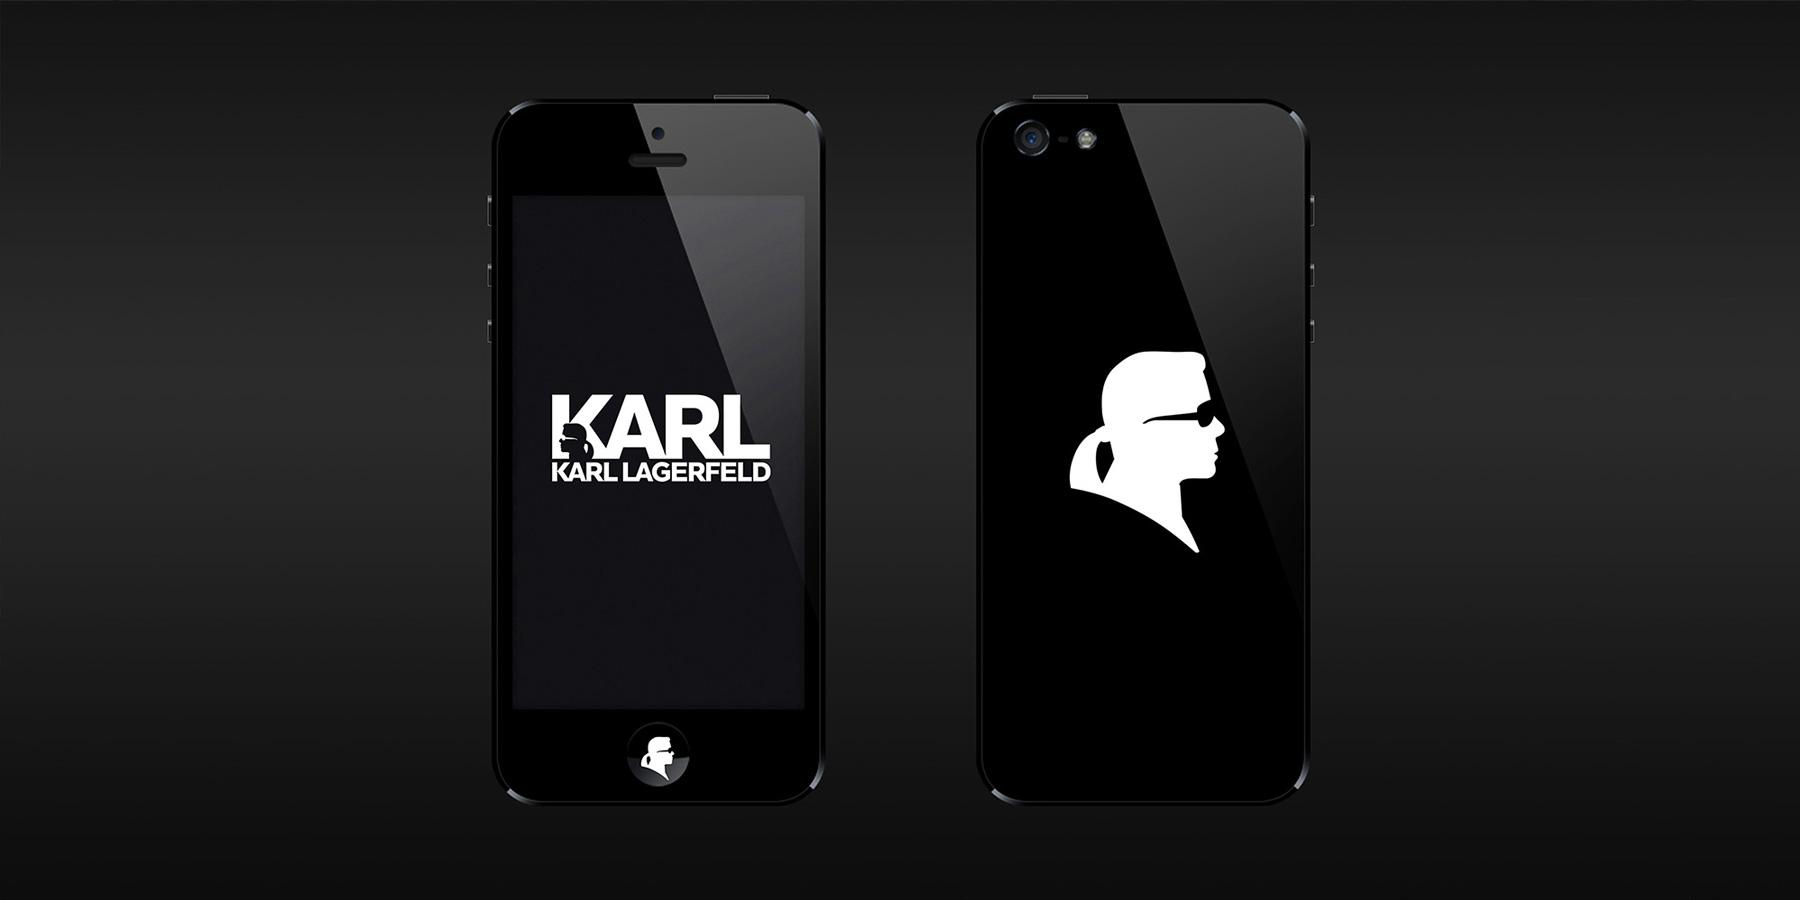 Karl Lagerfeld / Dutchy Design / Branding & Design Portfolio